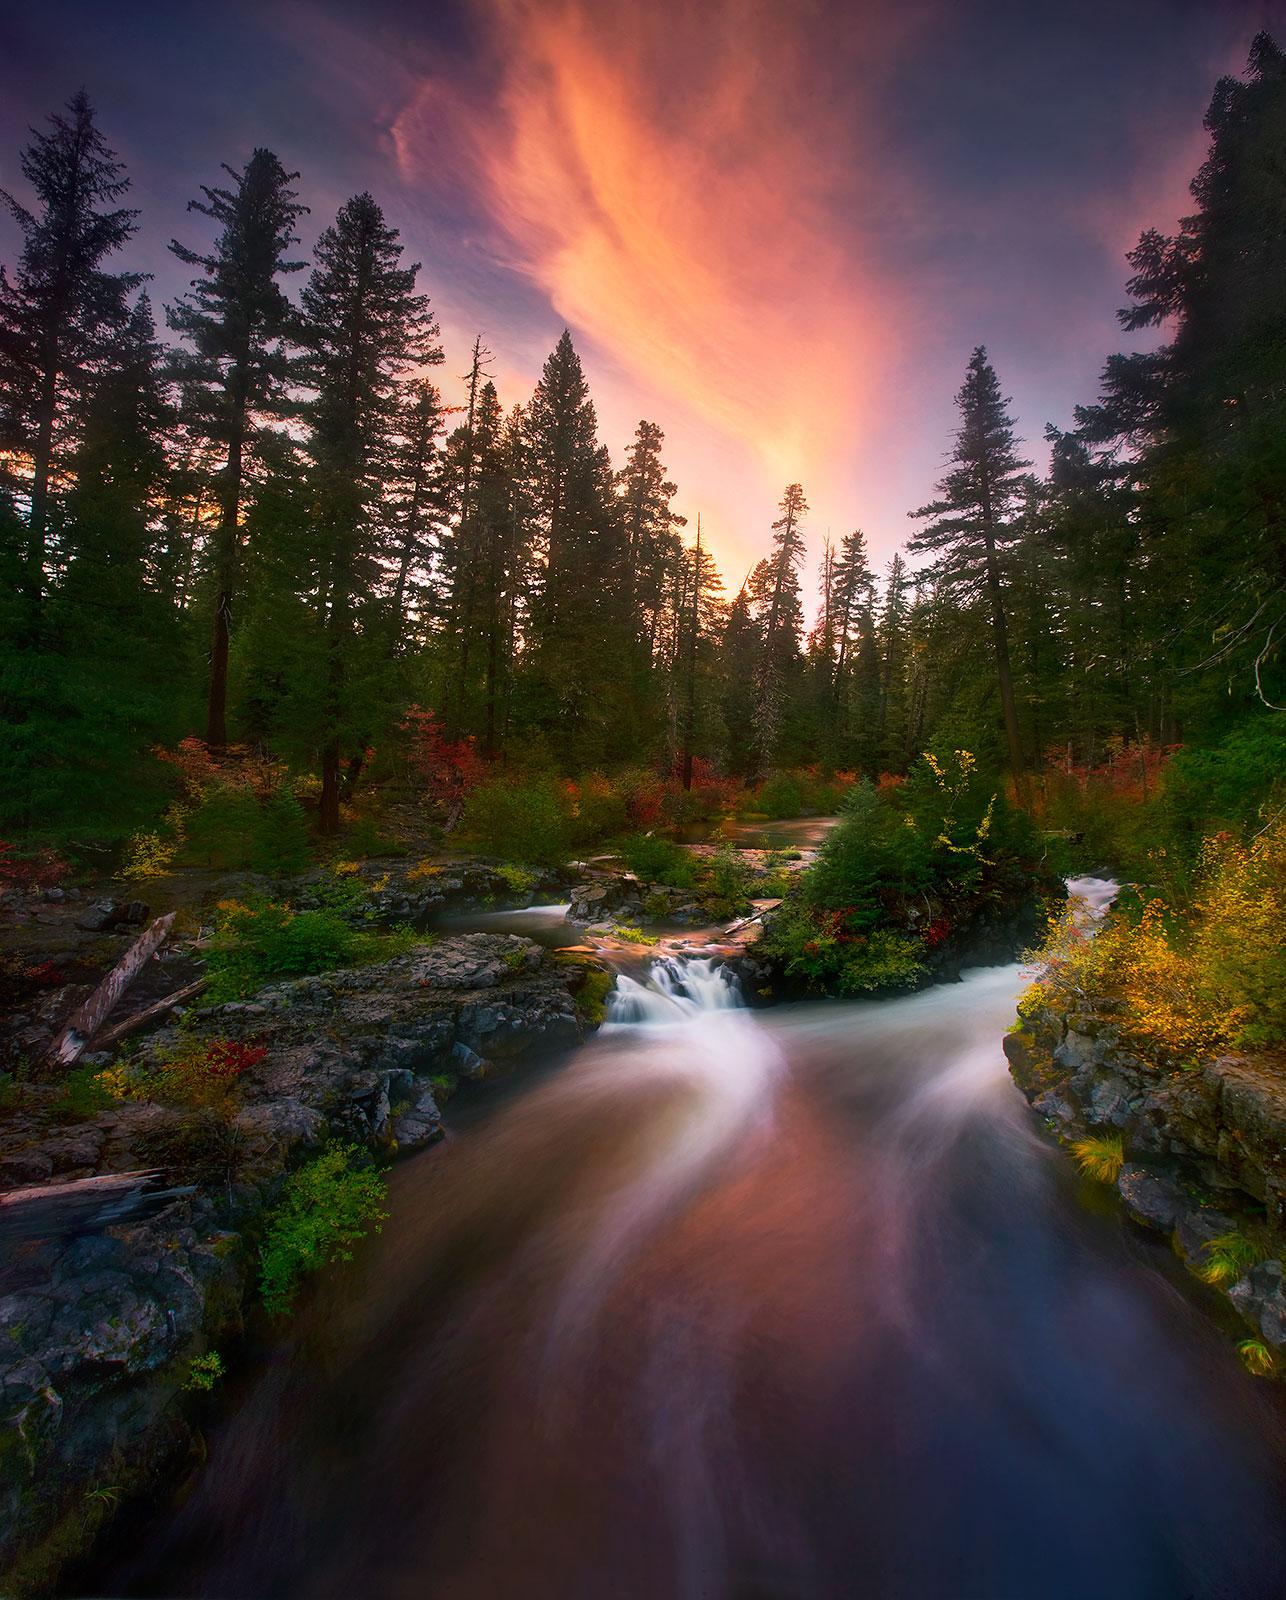 Sunset, Oregon, Rouge, River, Rouge River, Autumn, Foliage, Colorful, beautiful, wild, photo